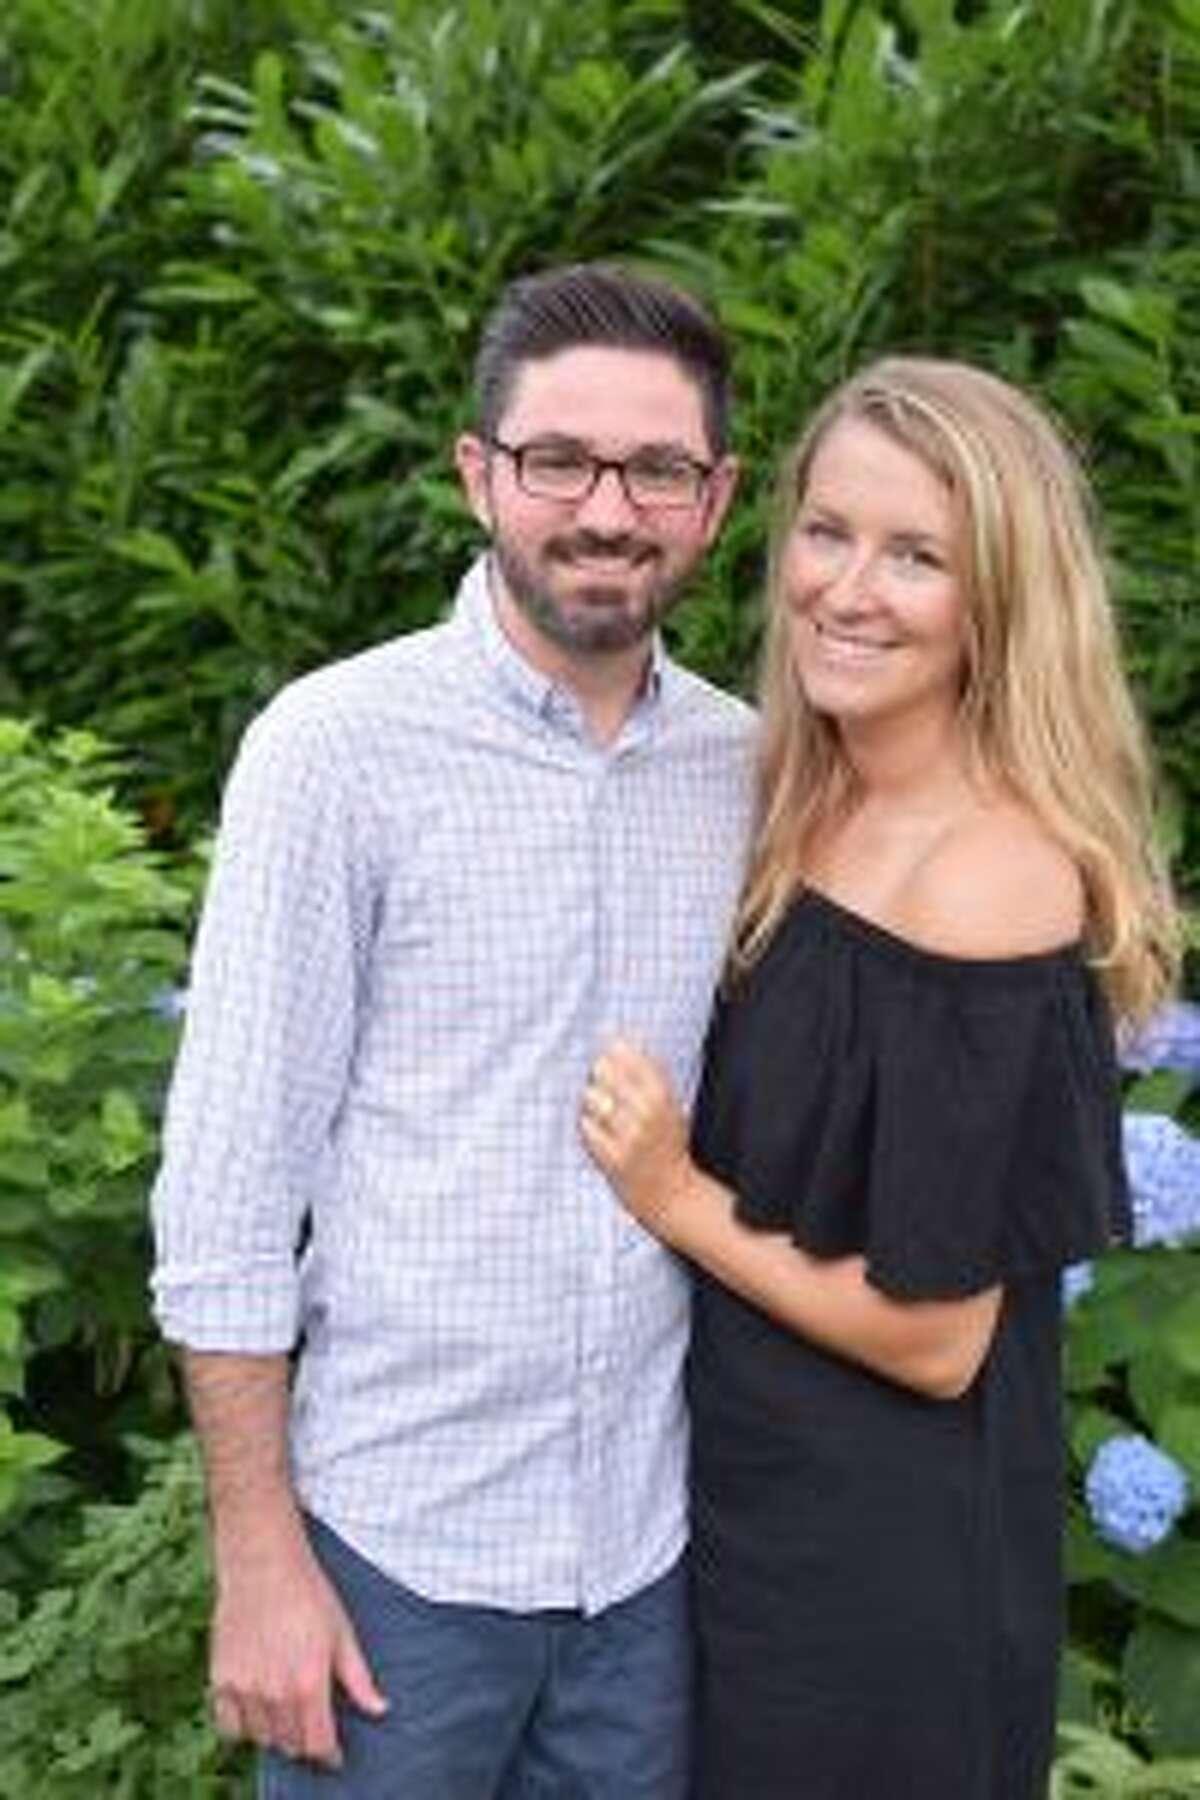 Nadina Dora Bourgeois and Jeffrey Neal Casullo were married on Aug. 25, 2018. Jeffrey Casullo, Nadina Bourgeois